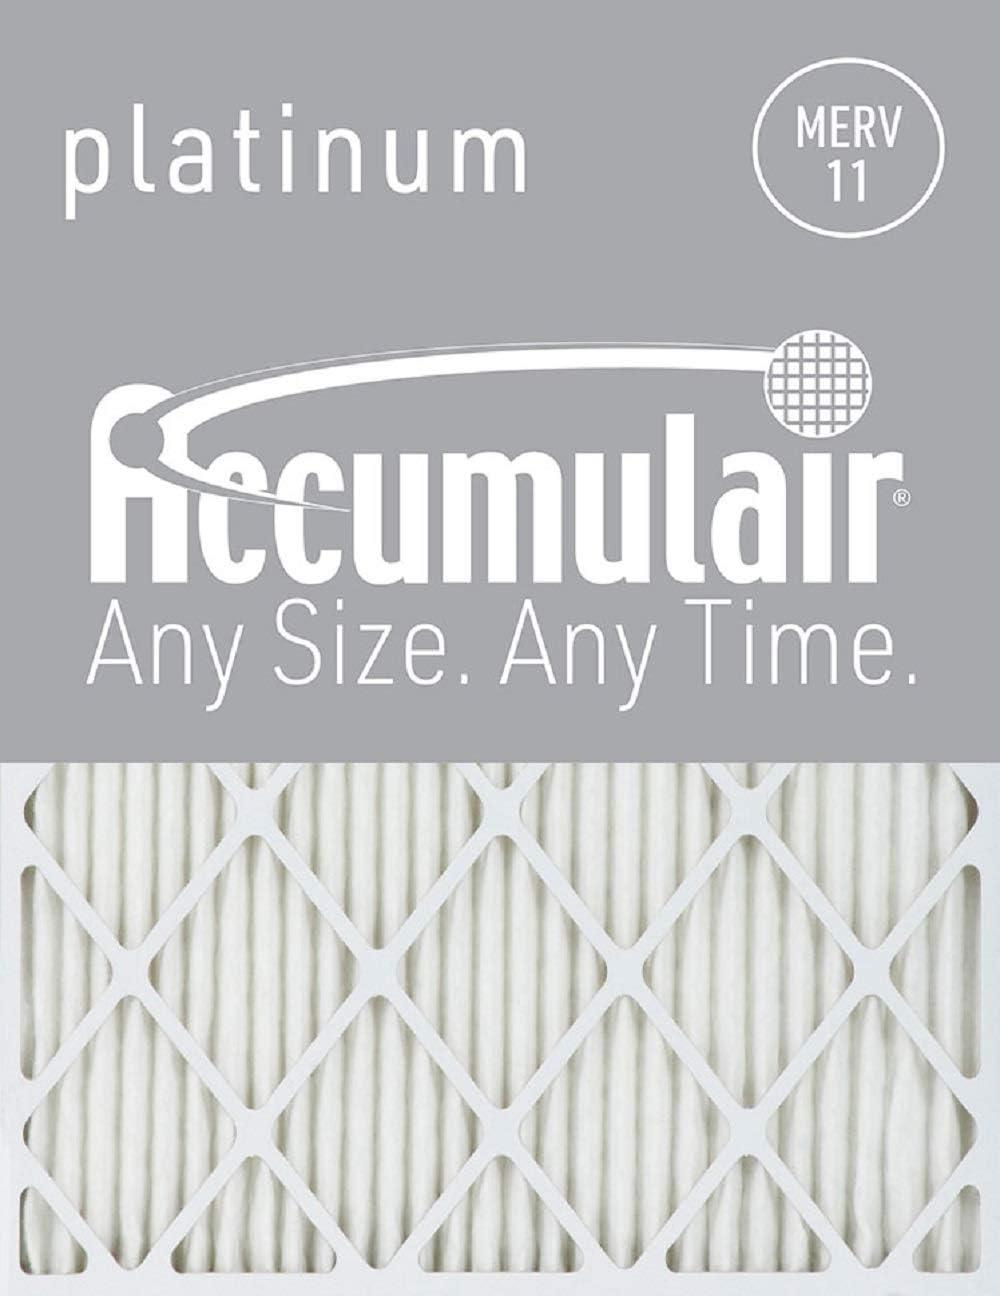 Accumulair Platinum 16x30x1 (15.5x29.5) MERV 11 Air Filter/Furnace Filters (6 pack)